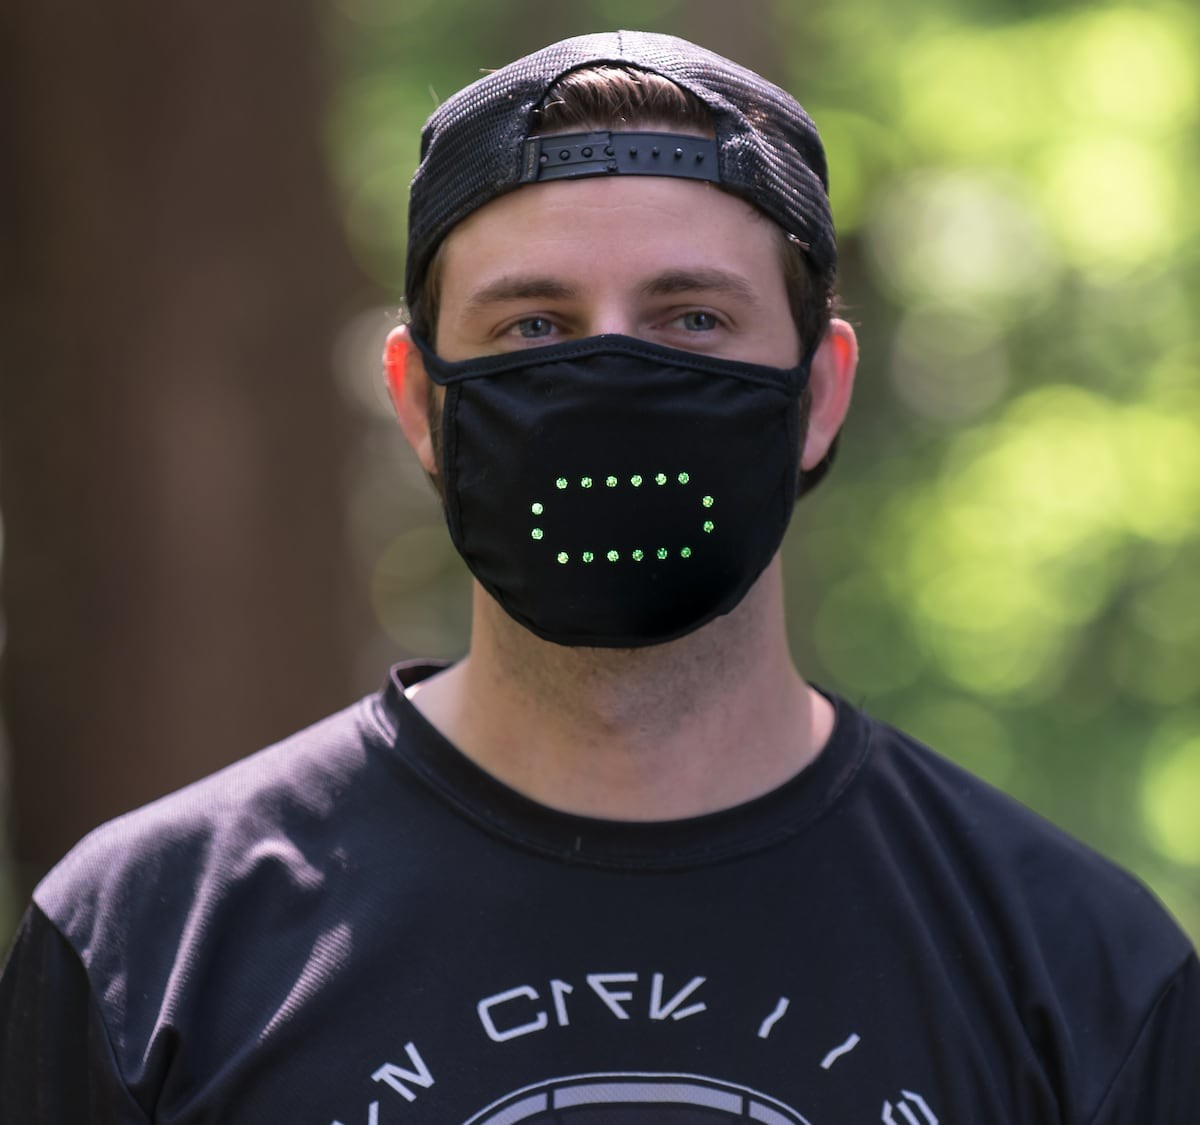 Mask Market LED Smart Light-Up Mask responds to your voice